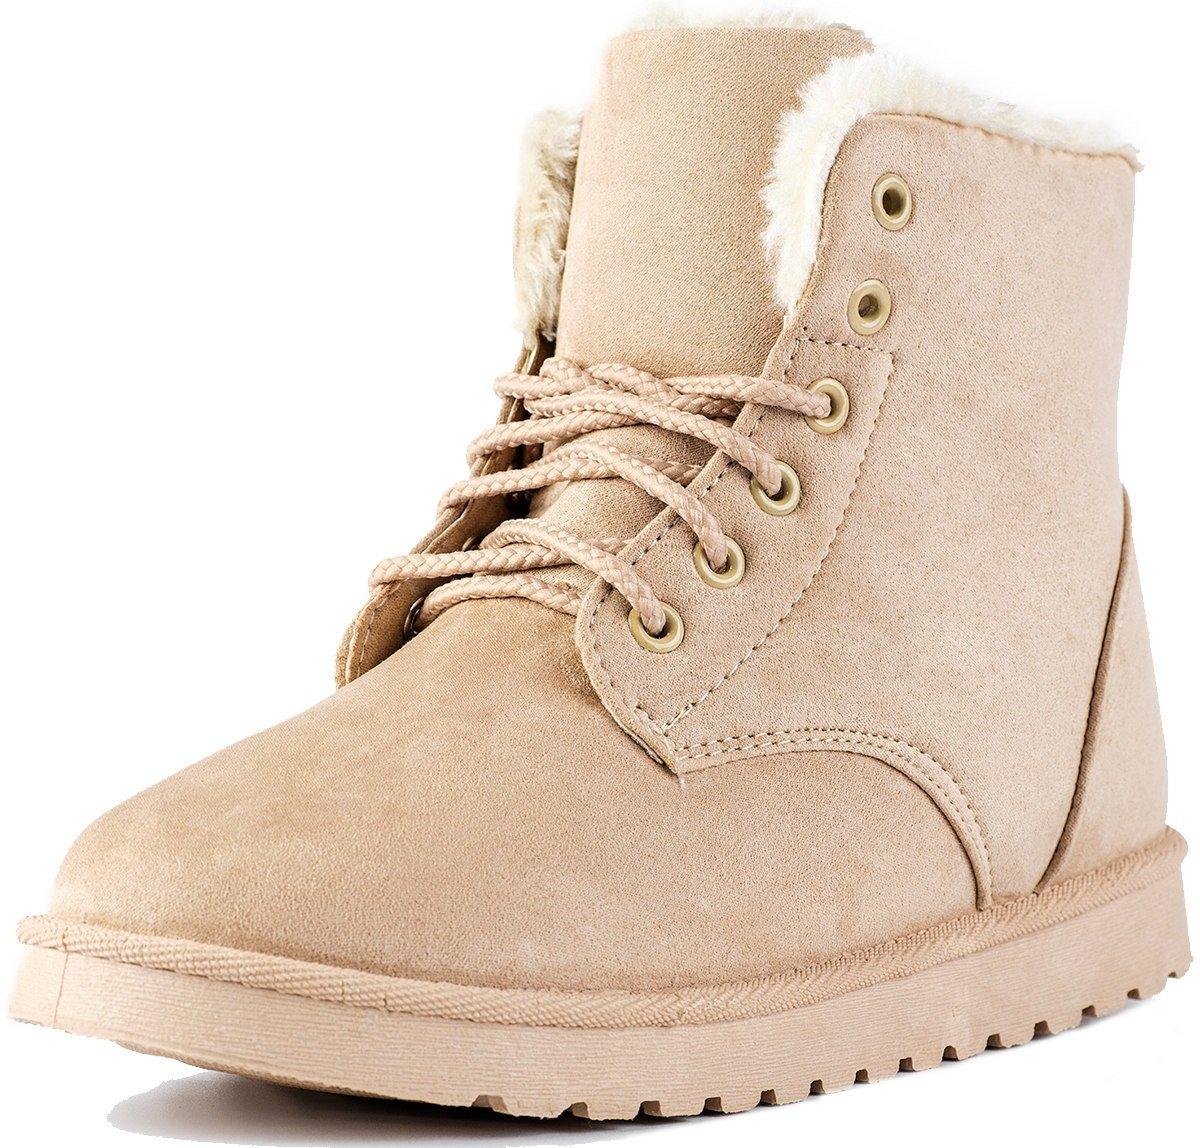 Keluomanduo Women's Winter Snow Boots Fur Liners Lace up Short Basic Ankle Booties B076D76ZPS 9 B(M) US|Beige